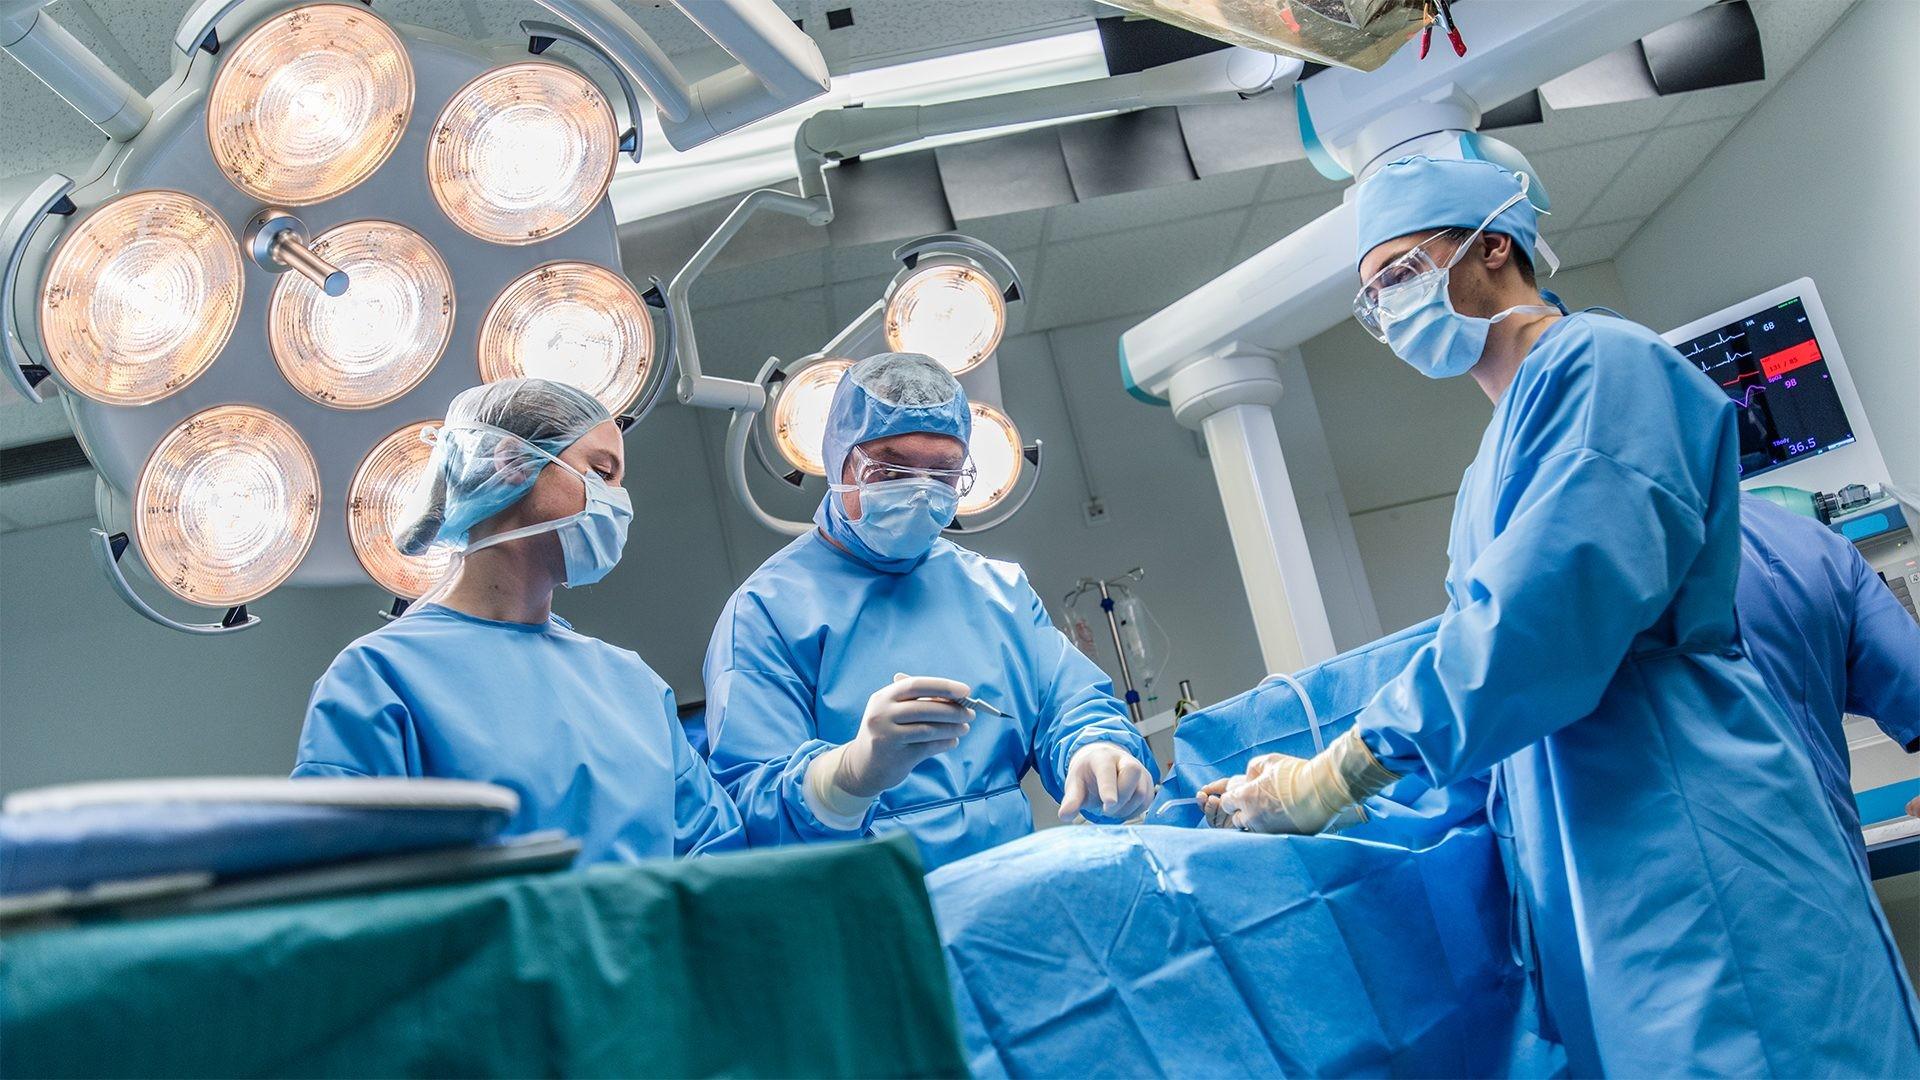 HOSPTAL OPERATION THEATRE  USA માટે છબી પરિણામ